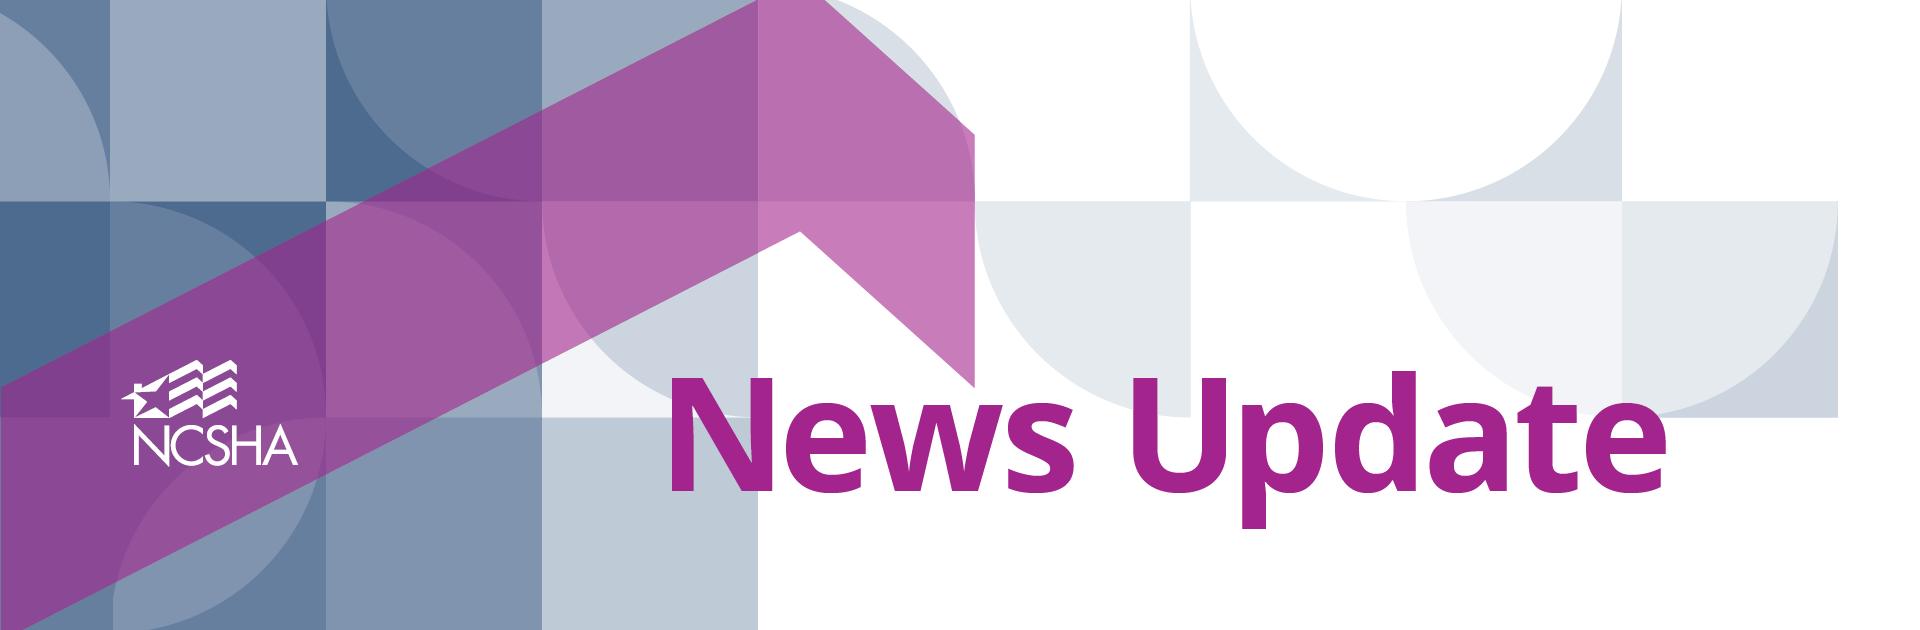 NCSHA News